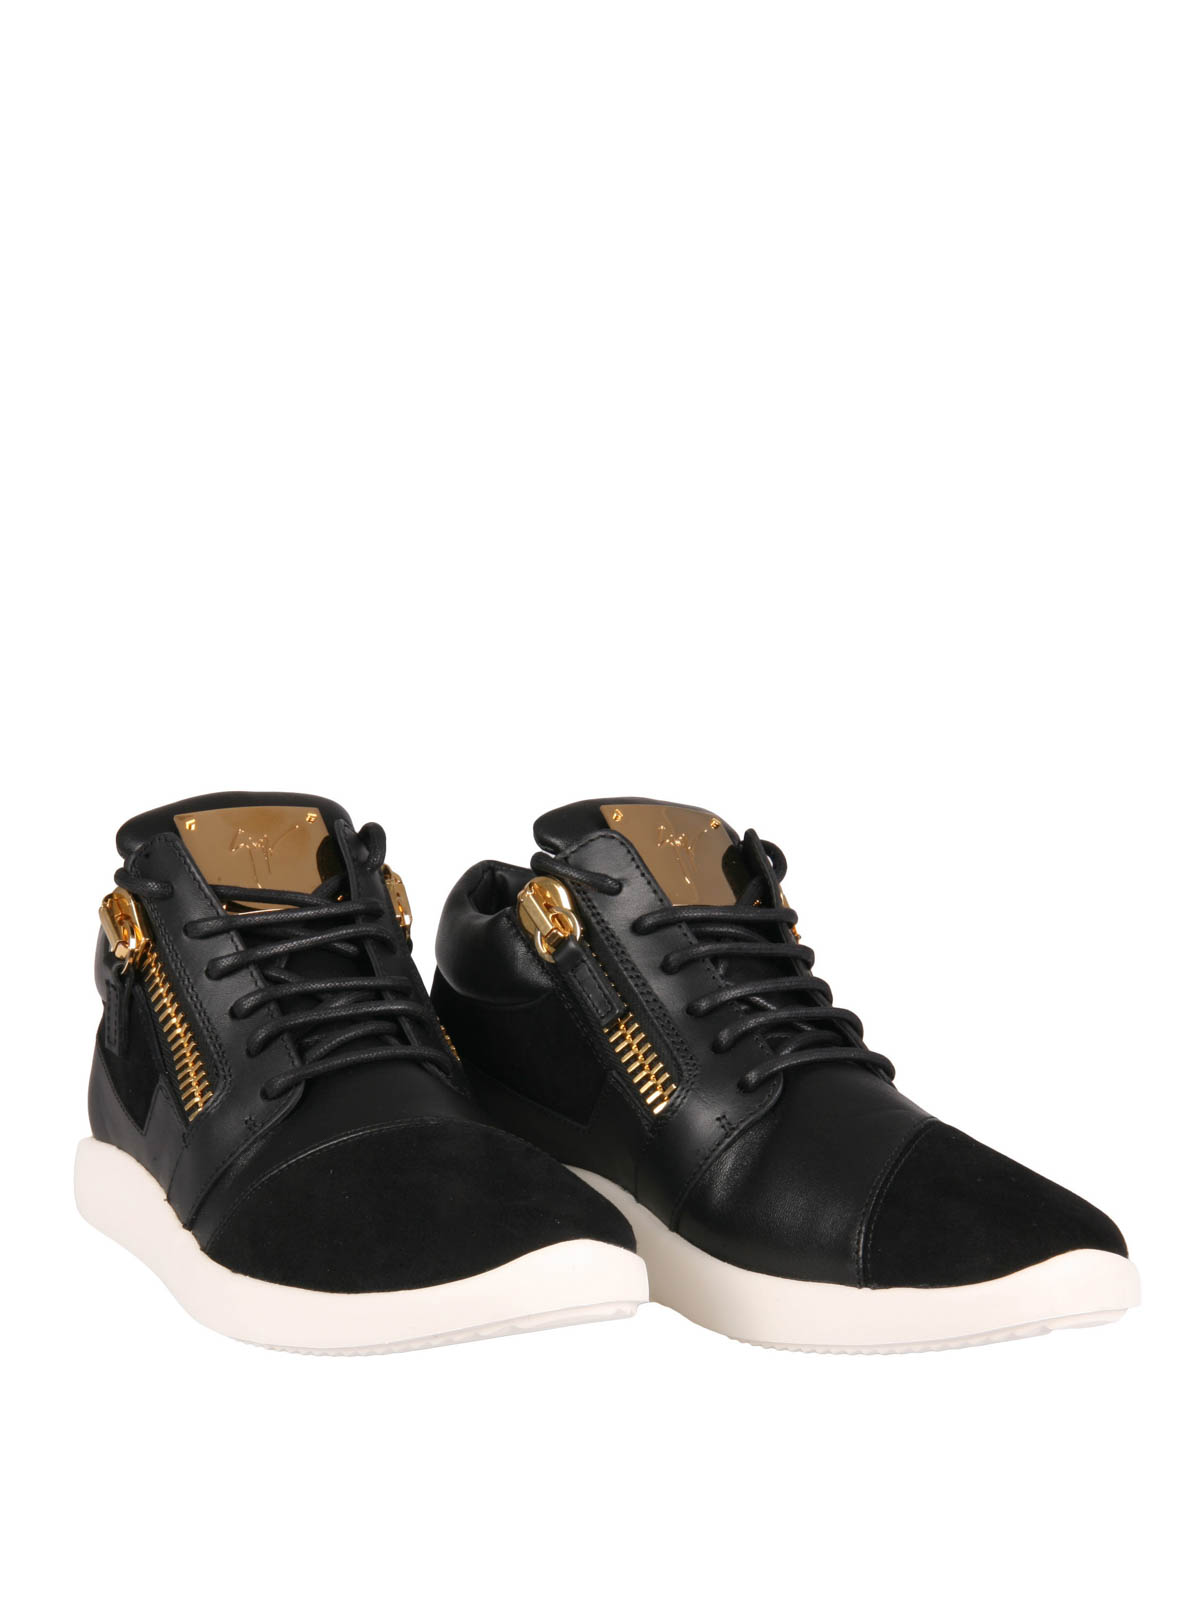 giuseppe zanotti sneaker fur damen schwarz sneaker. Black Bedroom Furniture Sets. Home Design Ideas